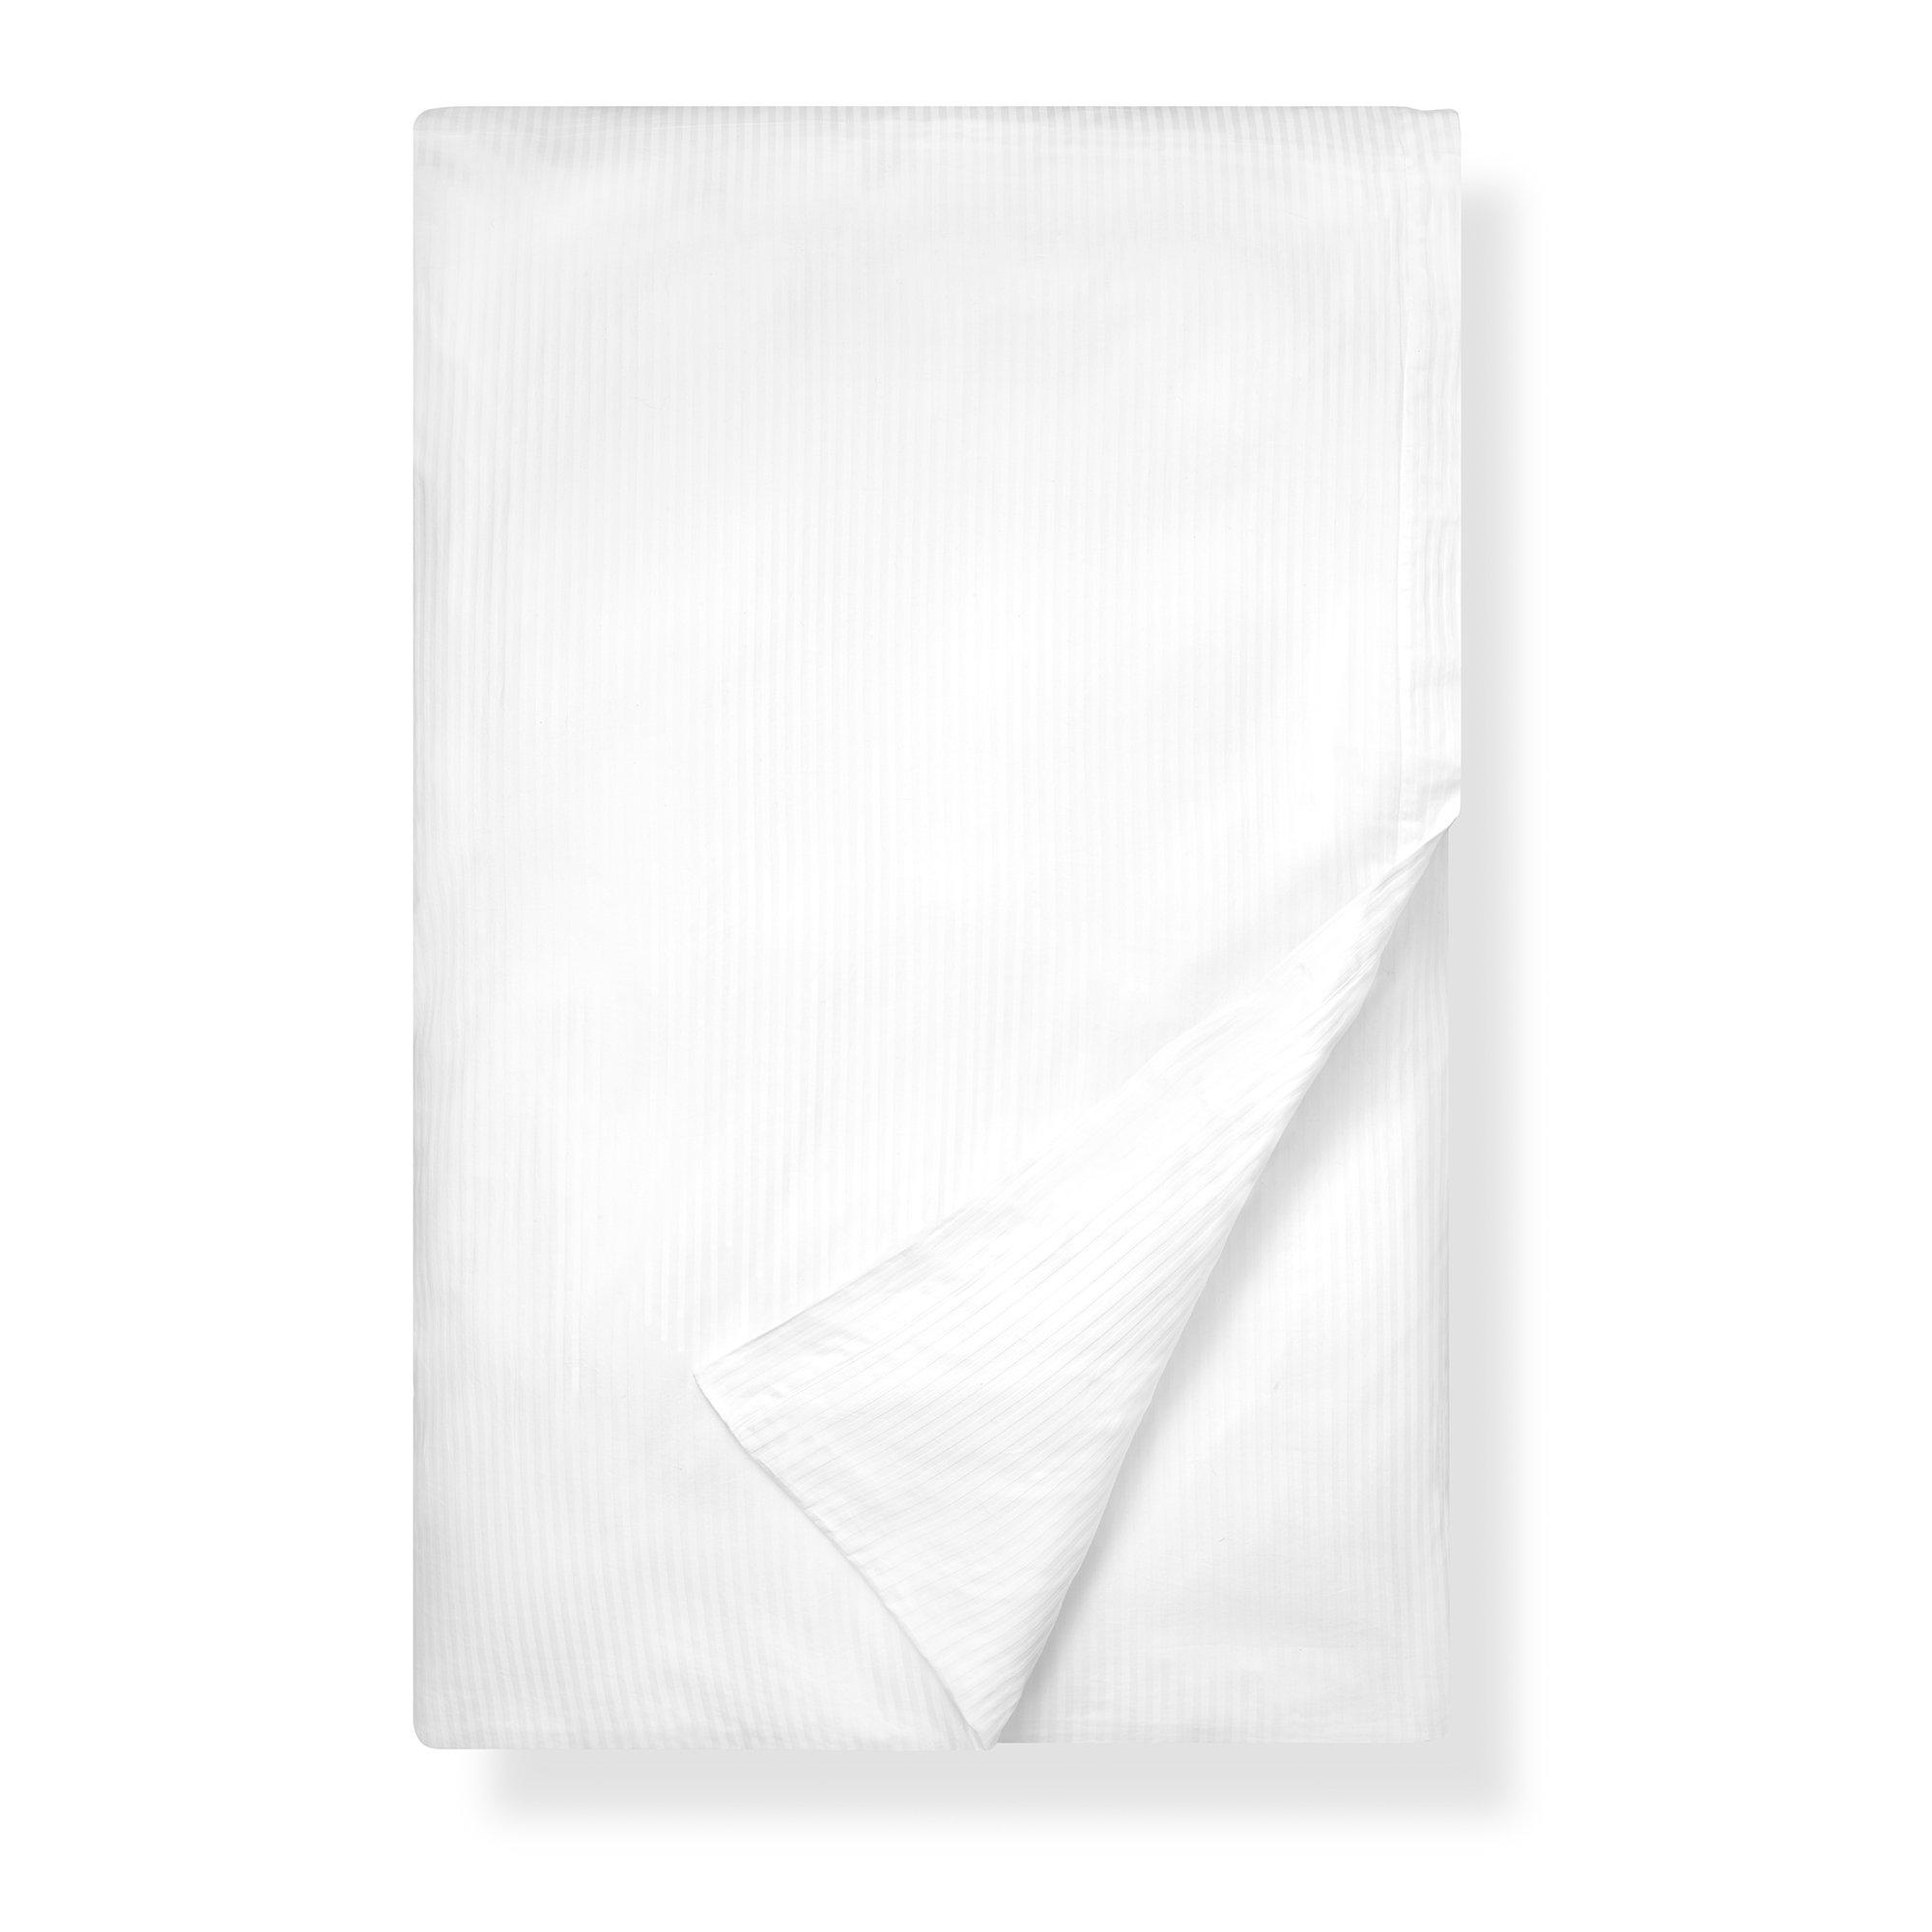 Boll & Branch Luxury Long Staple Organic Cotton Duvet Cover in Striped White - Full/Queen